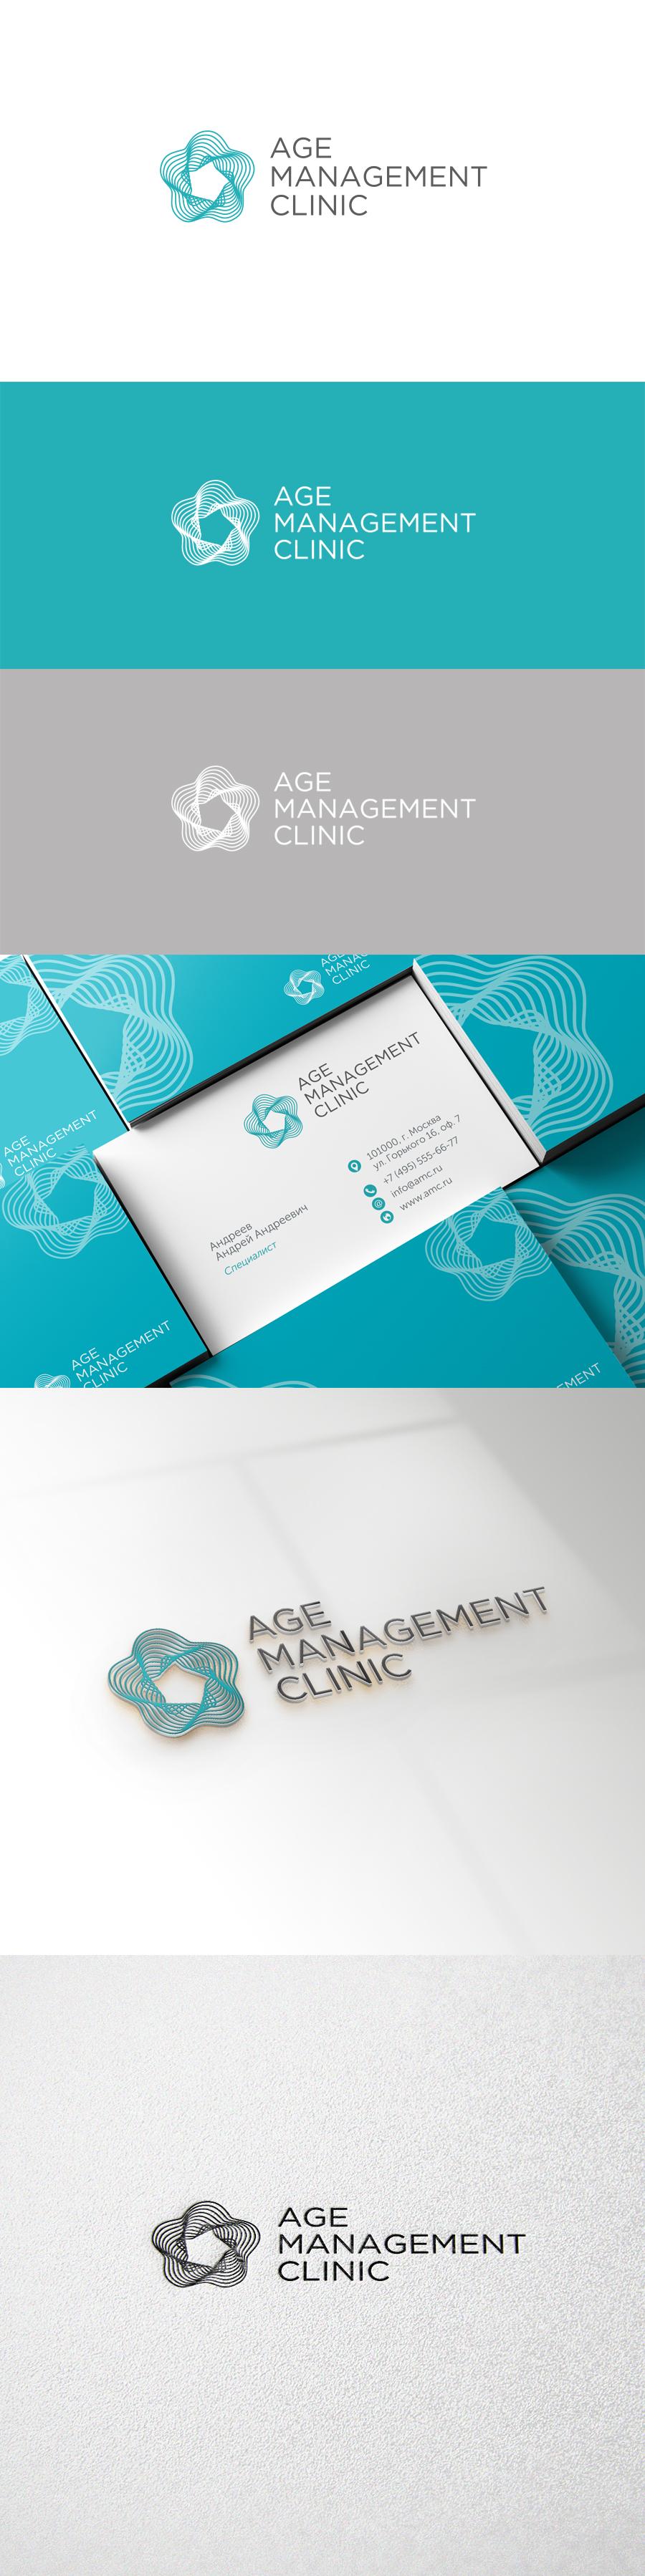 Логотип для медицинского центра (клиники)  фото f_2285ba14e071dee1.jpg